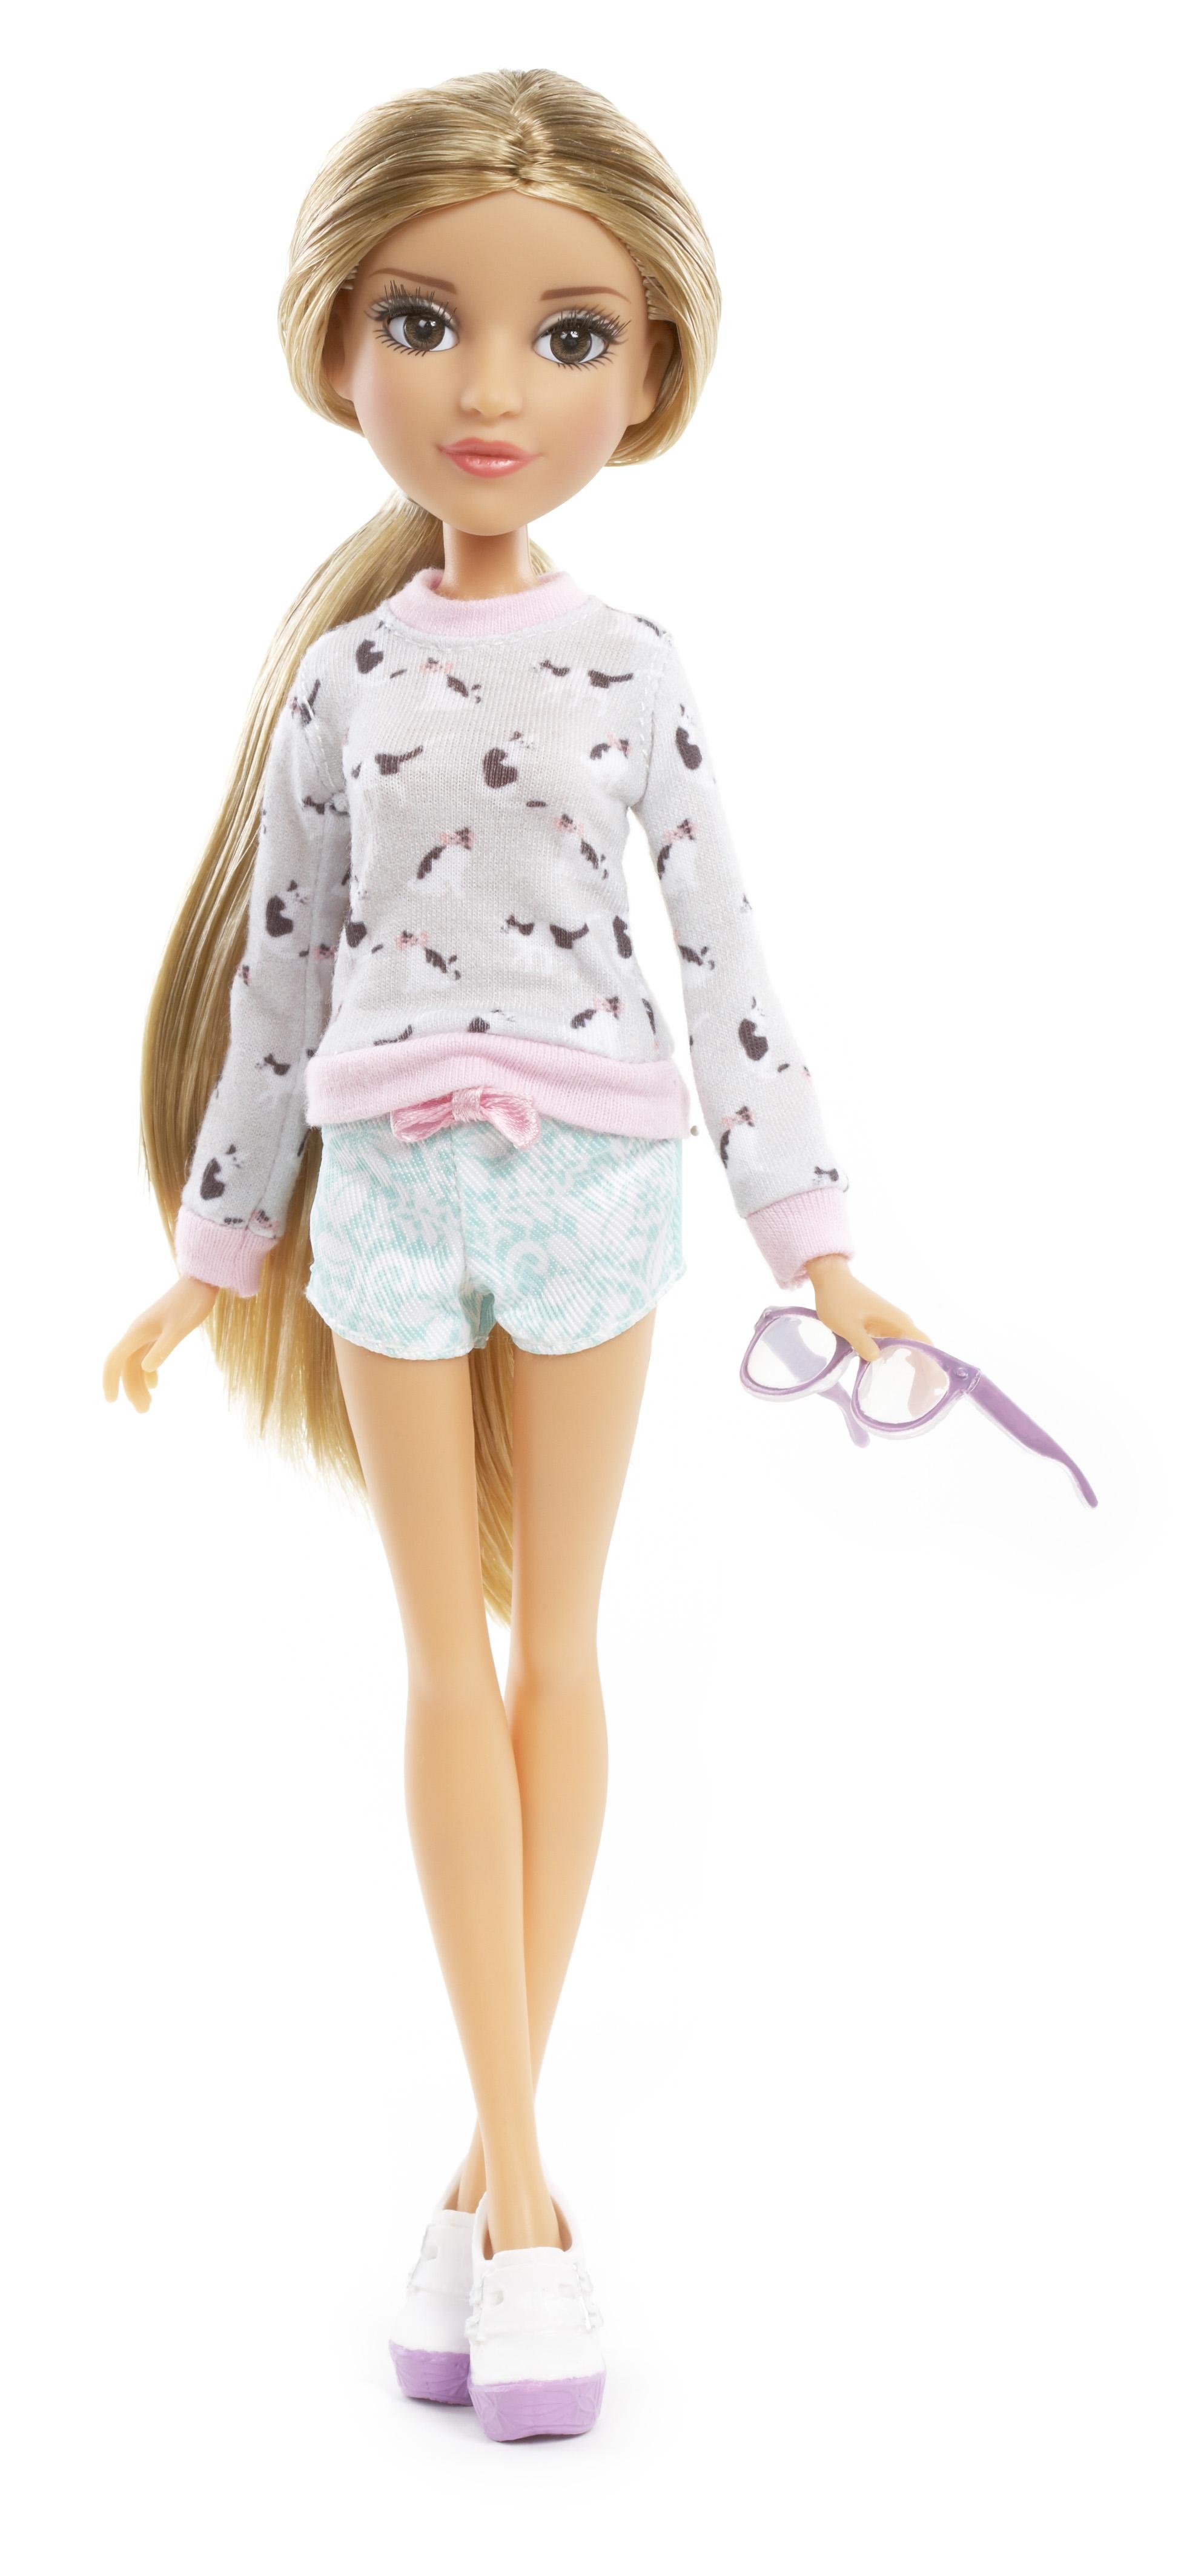 Кукла MC2 Адрианна project mс2 537557 базовая кукла брайден